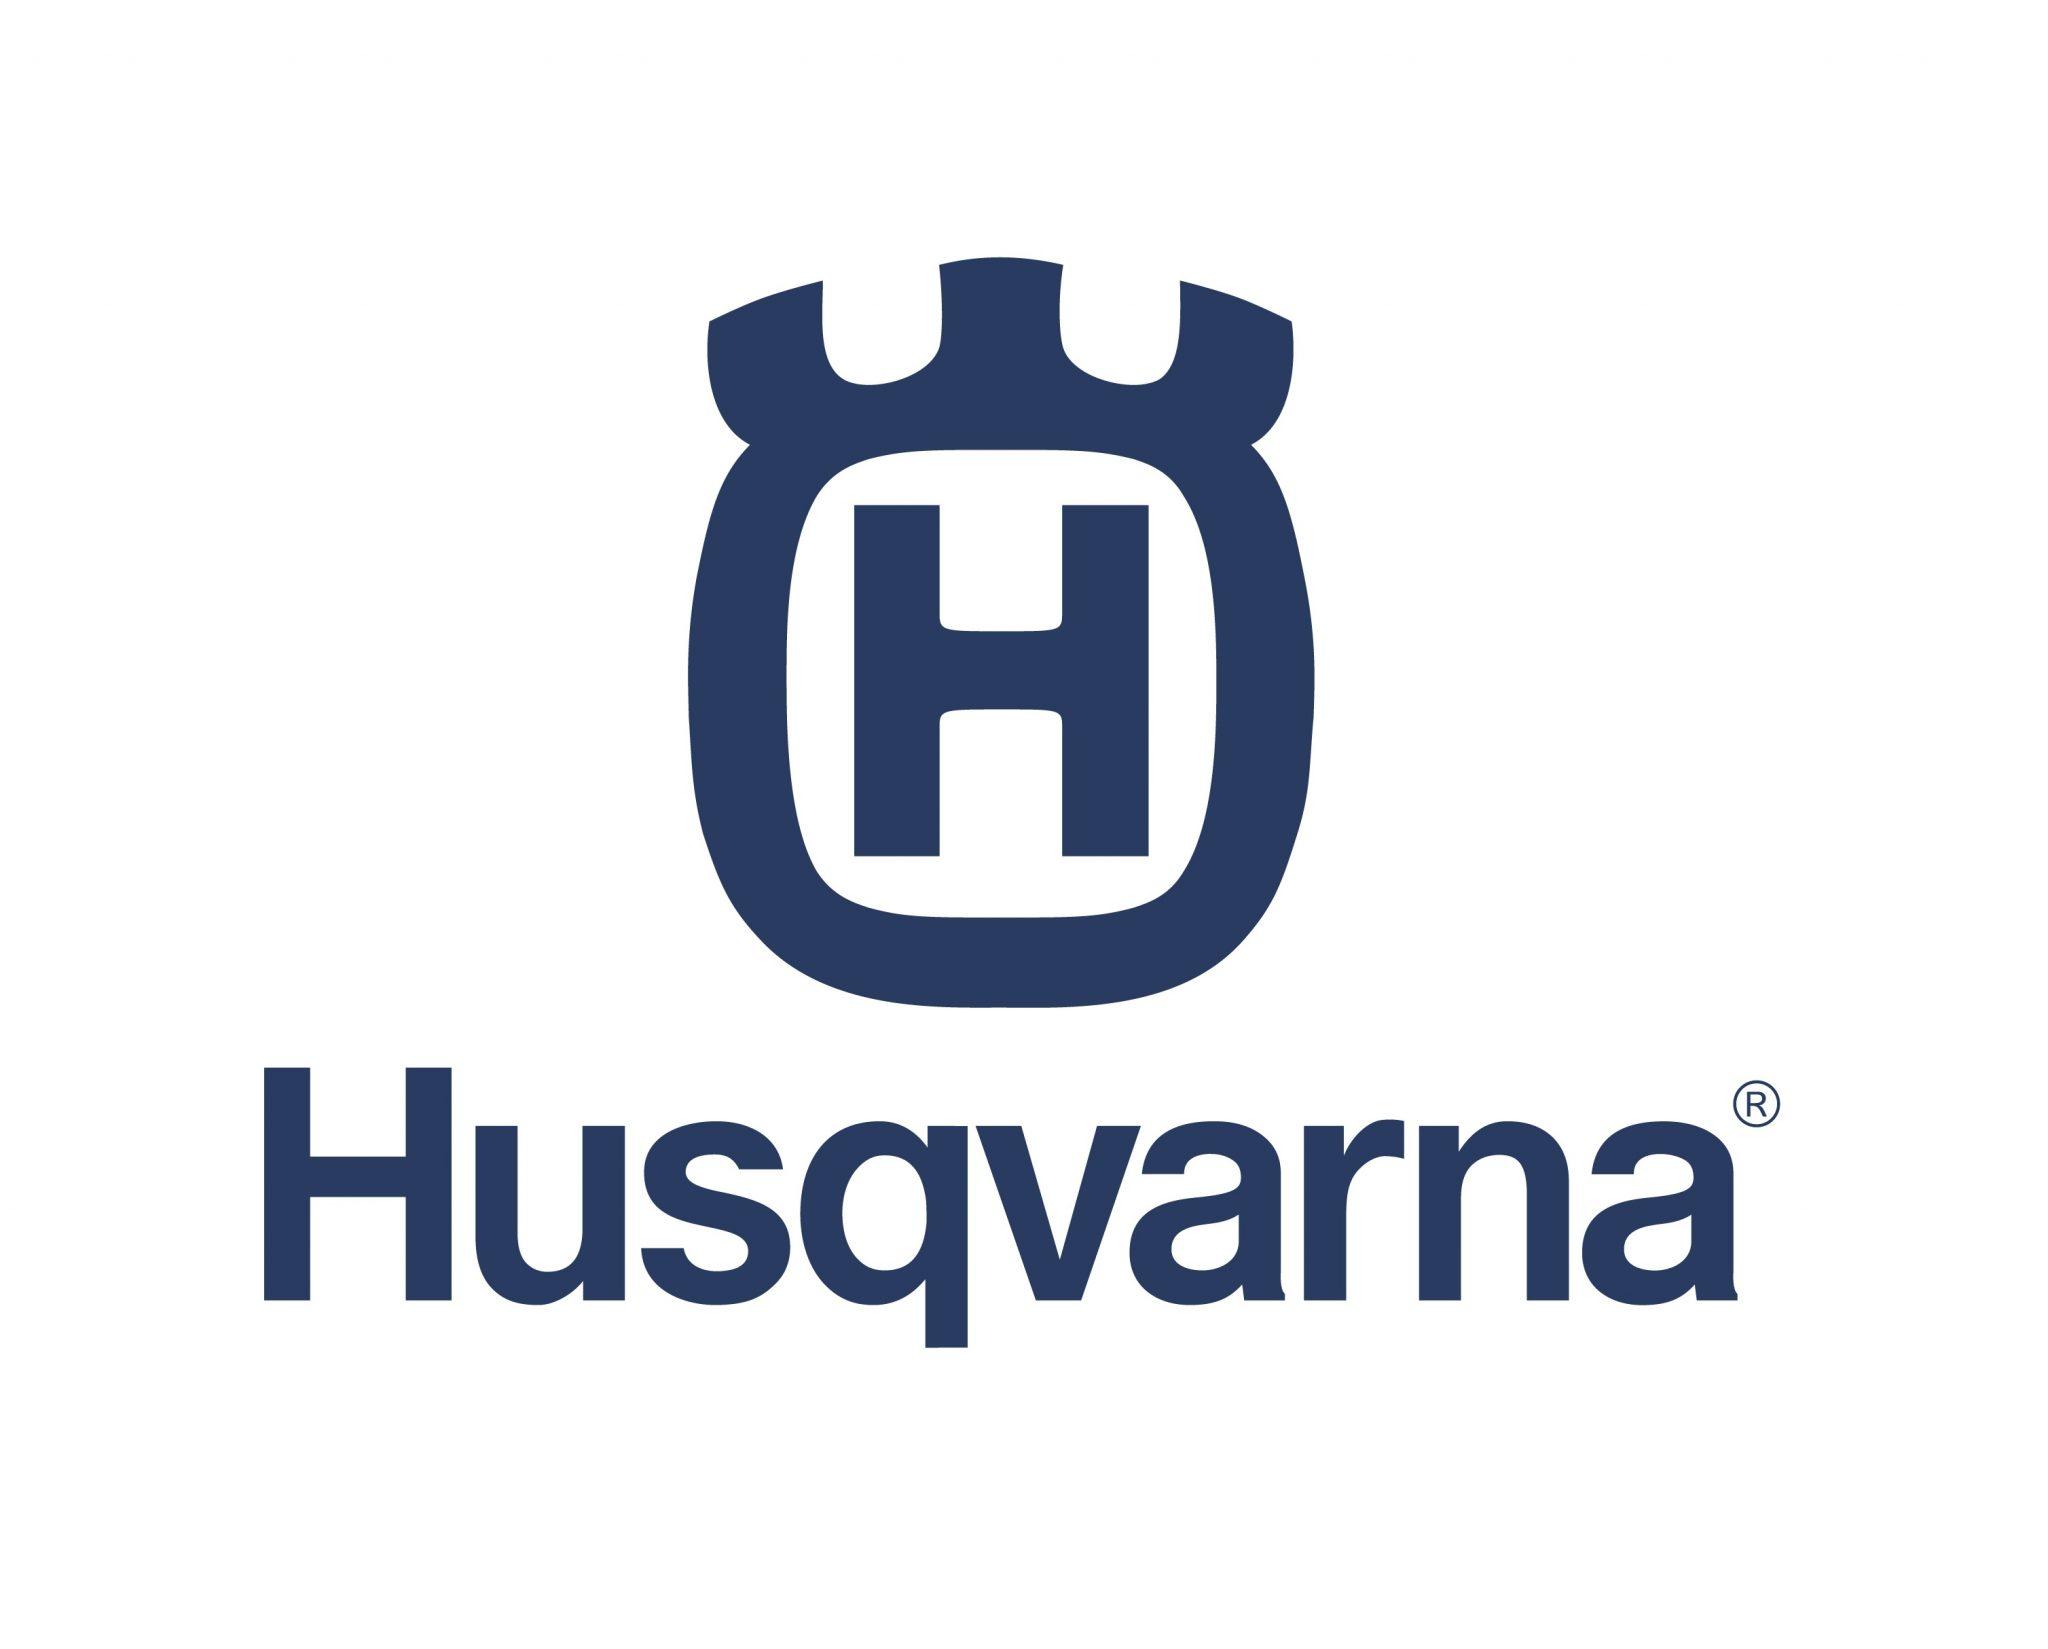 Husqvarna logo 2